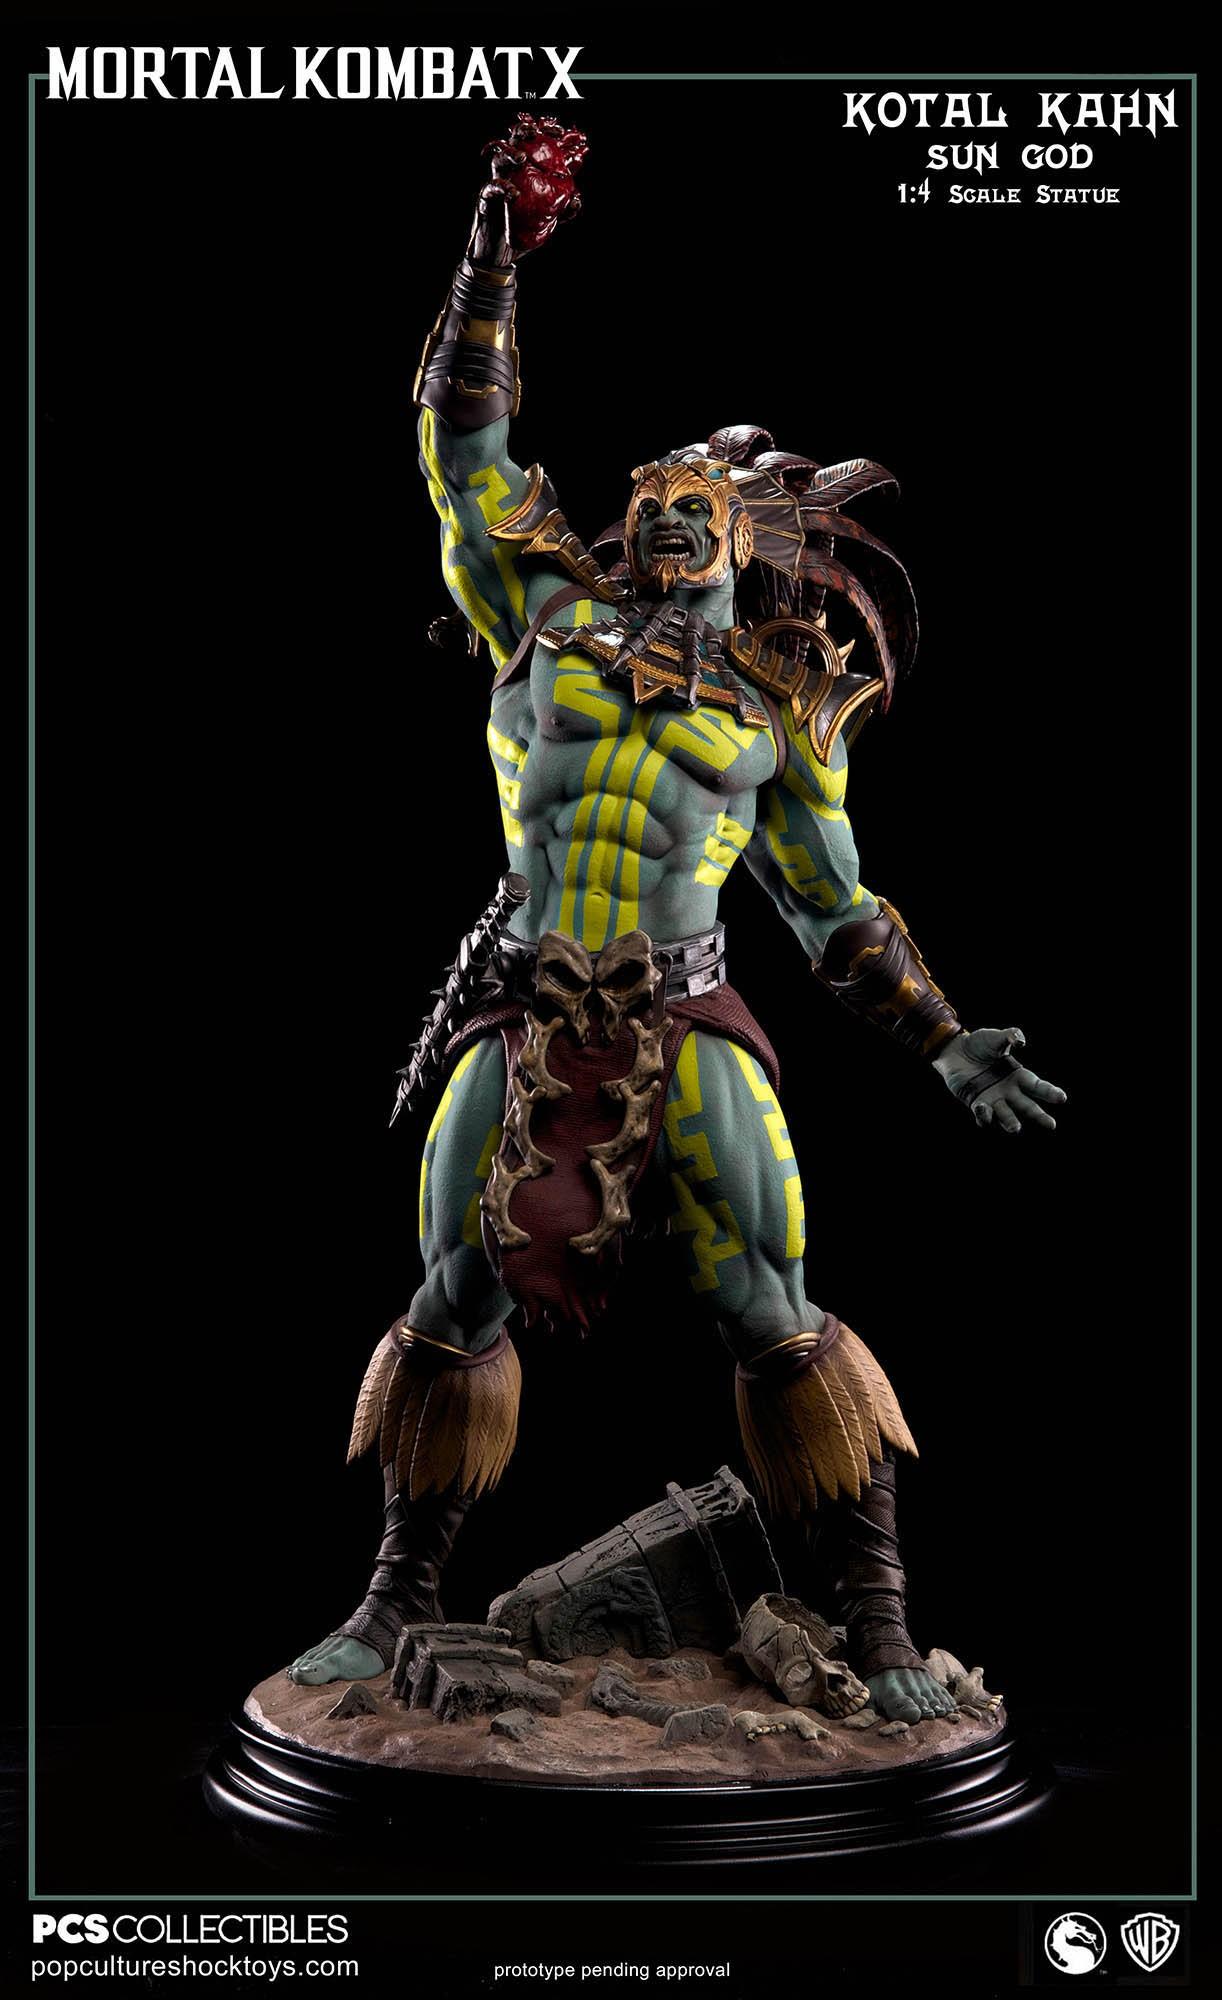 [Pop Culture Shock] Mortal Kombat X: Kotal Kahn 1:4 scale PCS-Kotal-Kahn-Sun-God-005